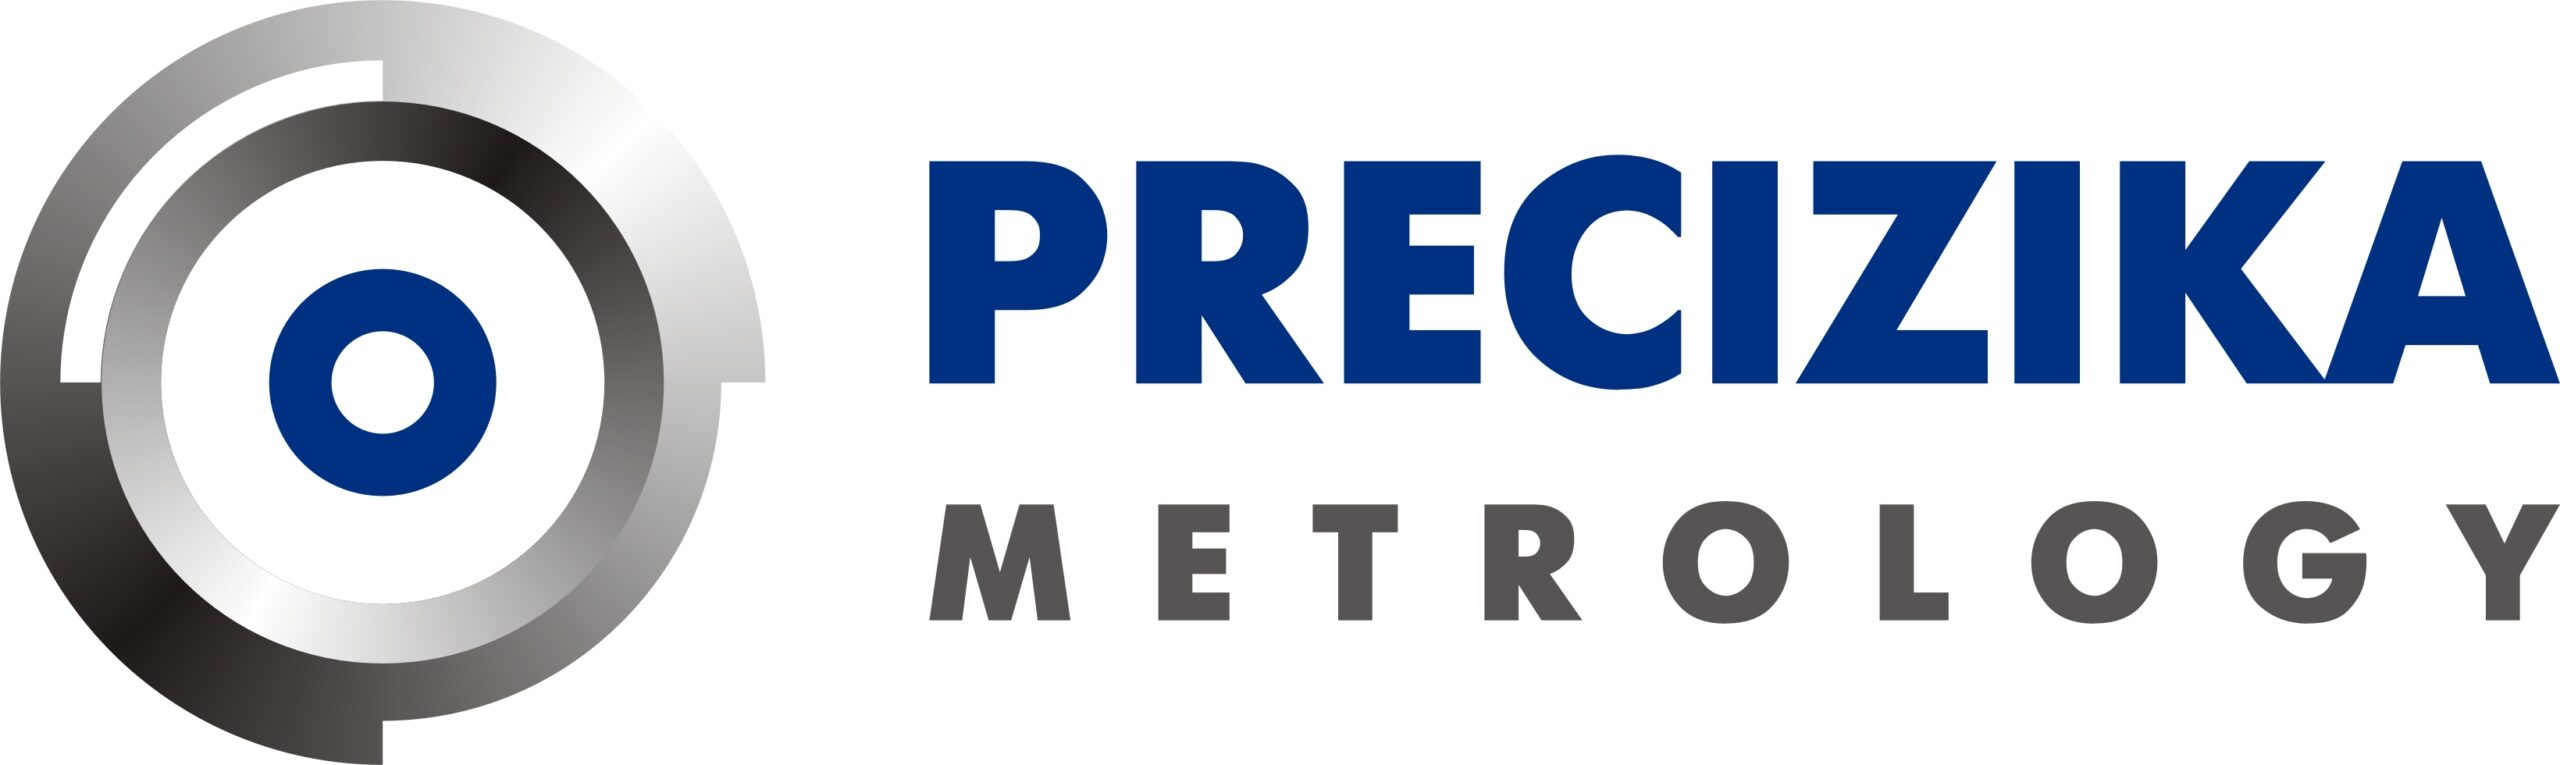 precizika logo